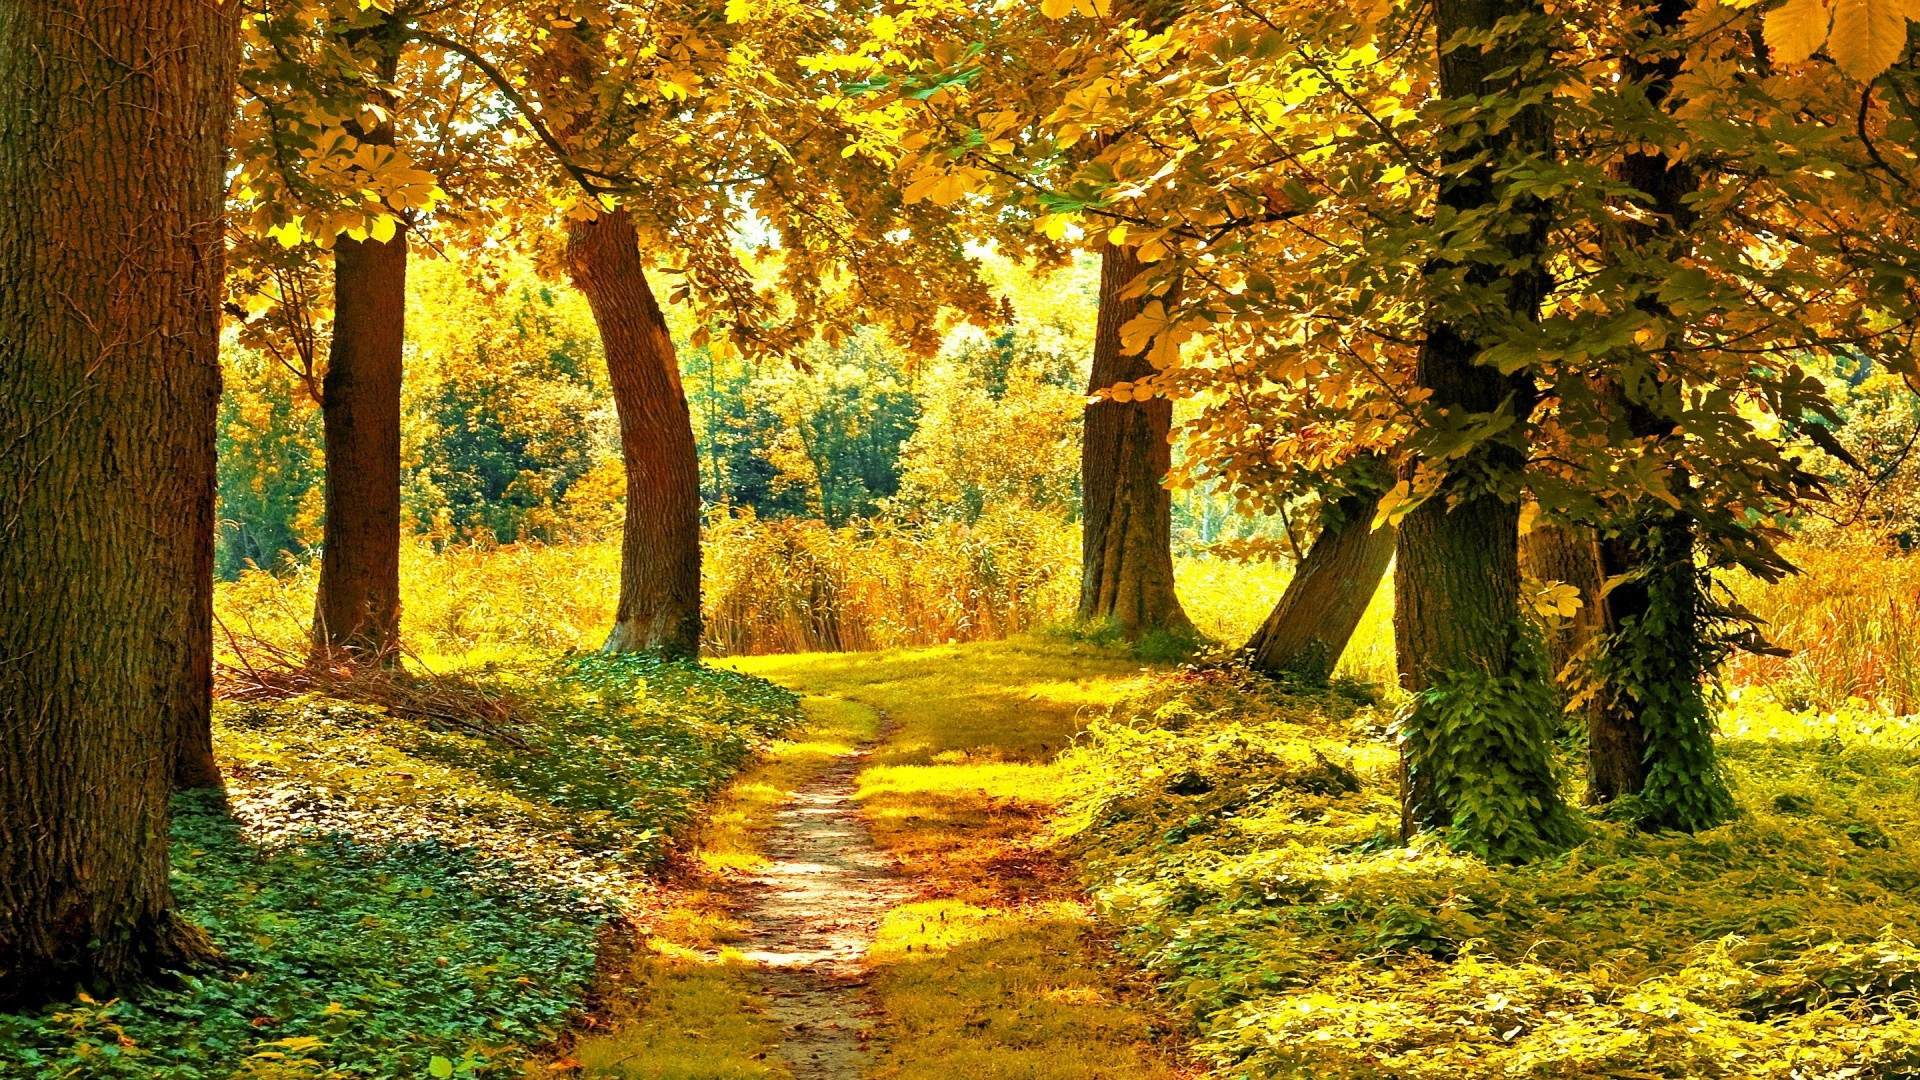 21+ Best HD Autumn Landscape Wallpapers | feelgrPH · Landscape  WallpaperWallpaper Desktop